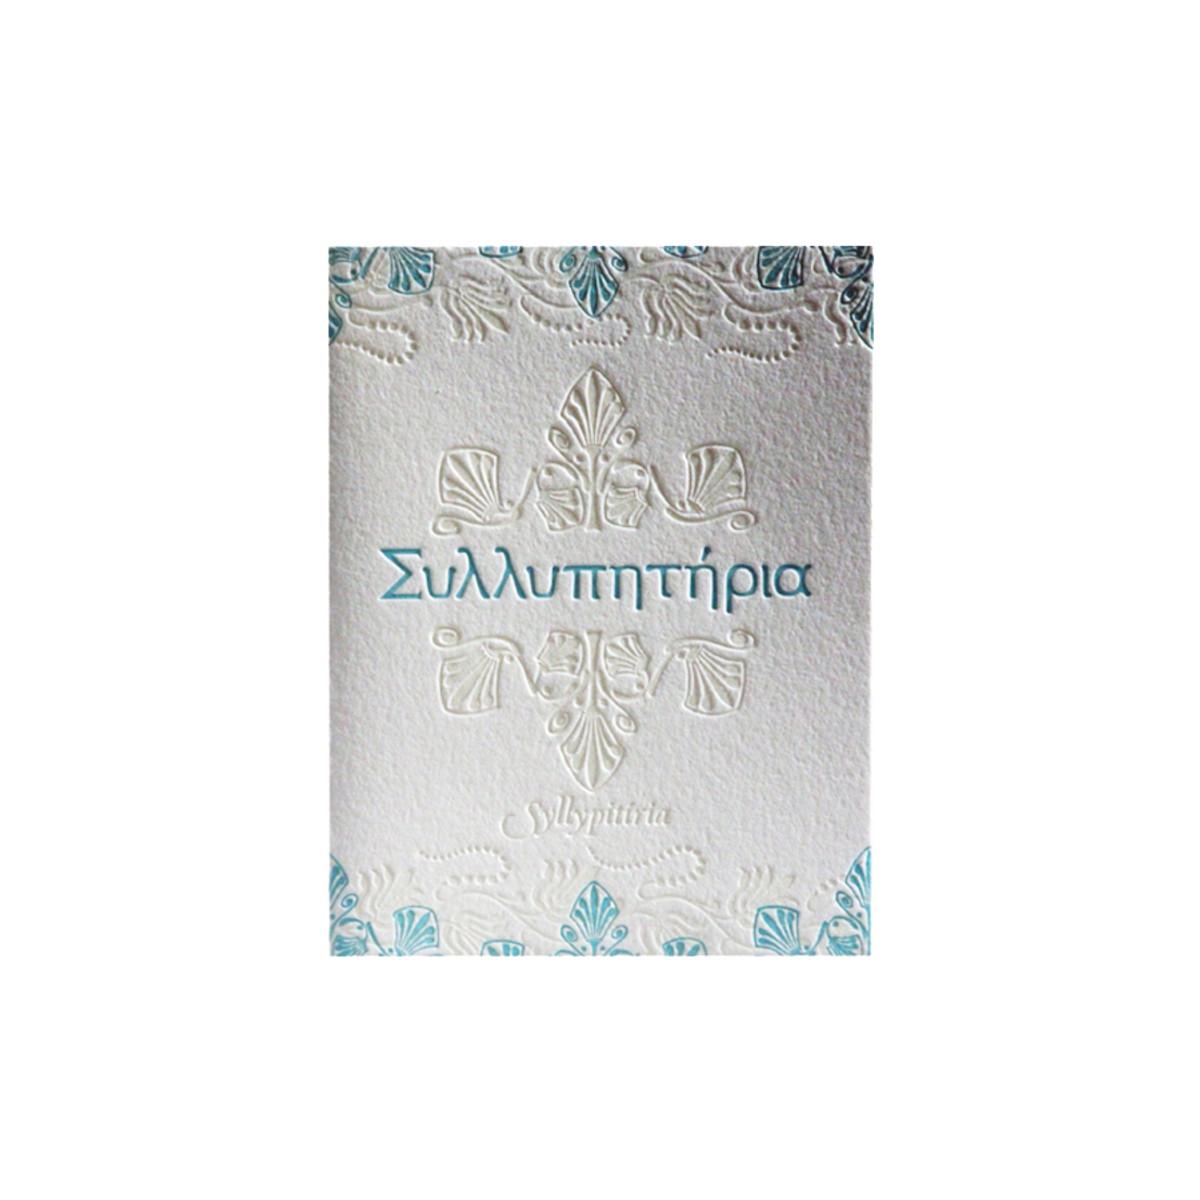 Syllypitiria Letterpress Greek Sympathy Card Image And Likeness